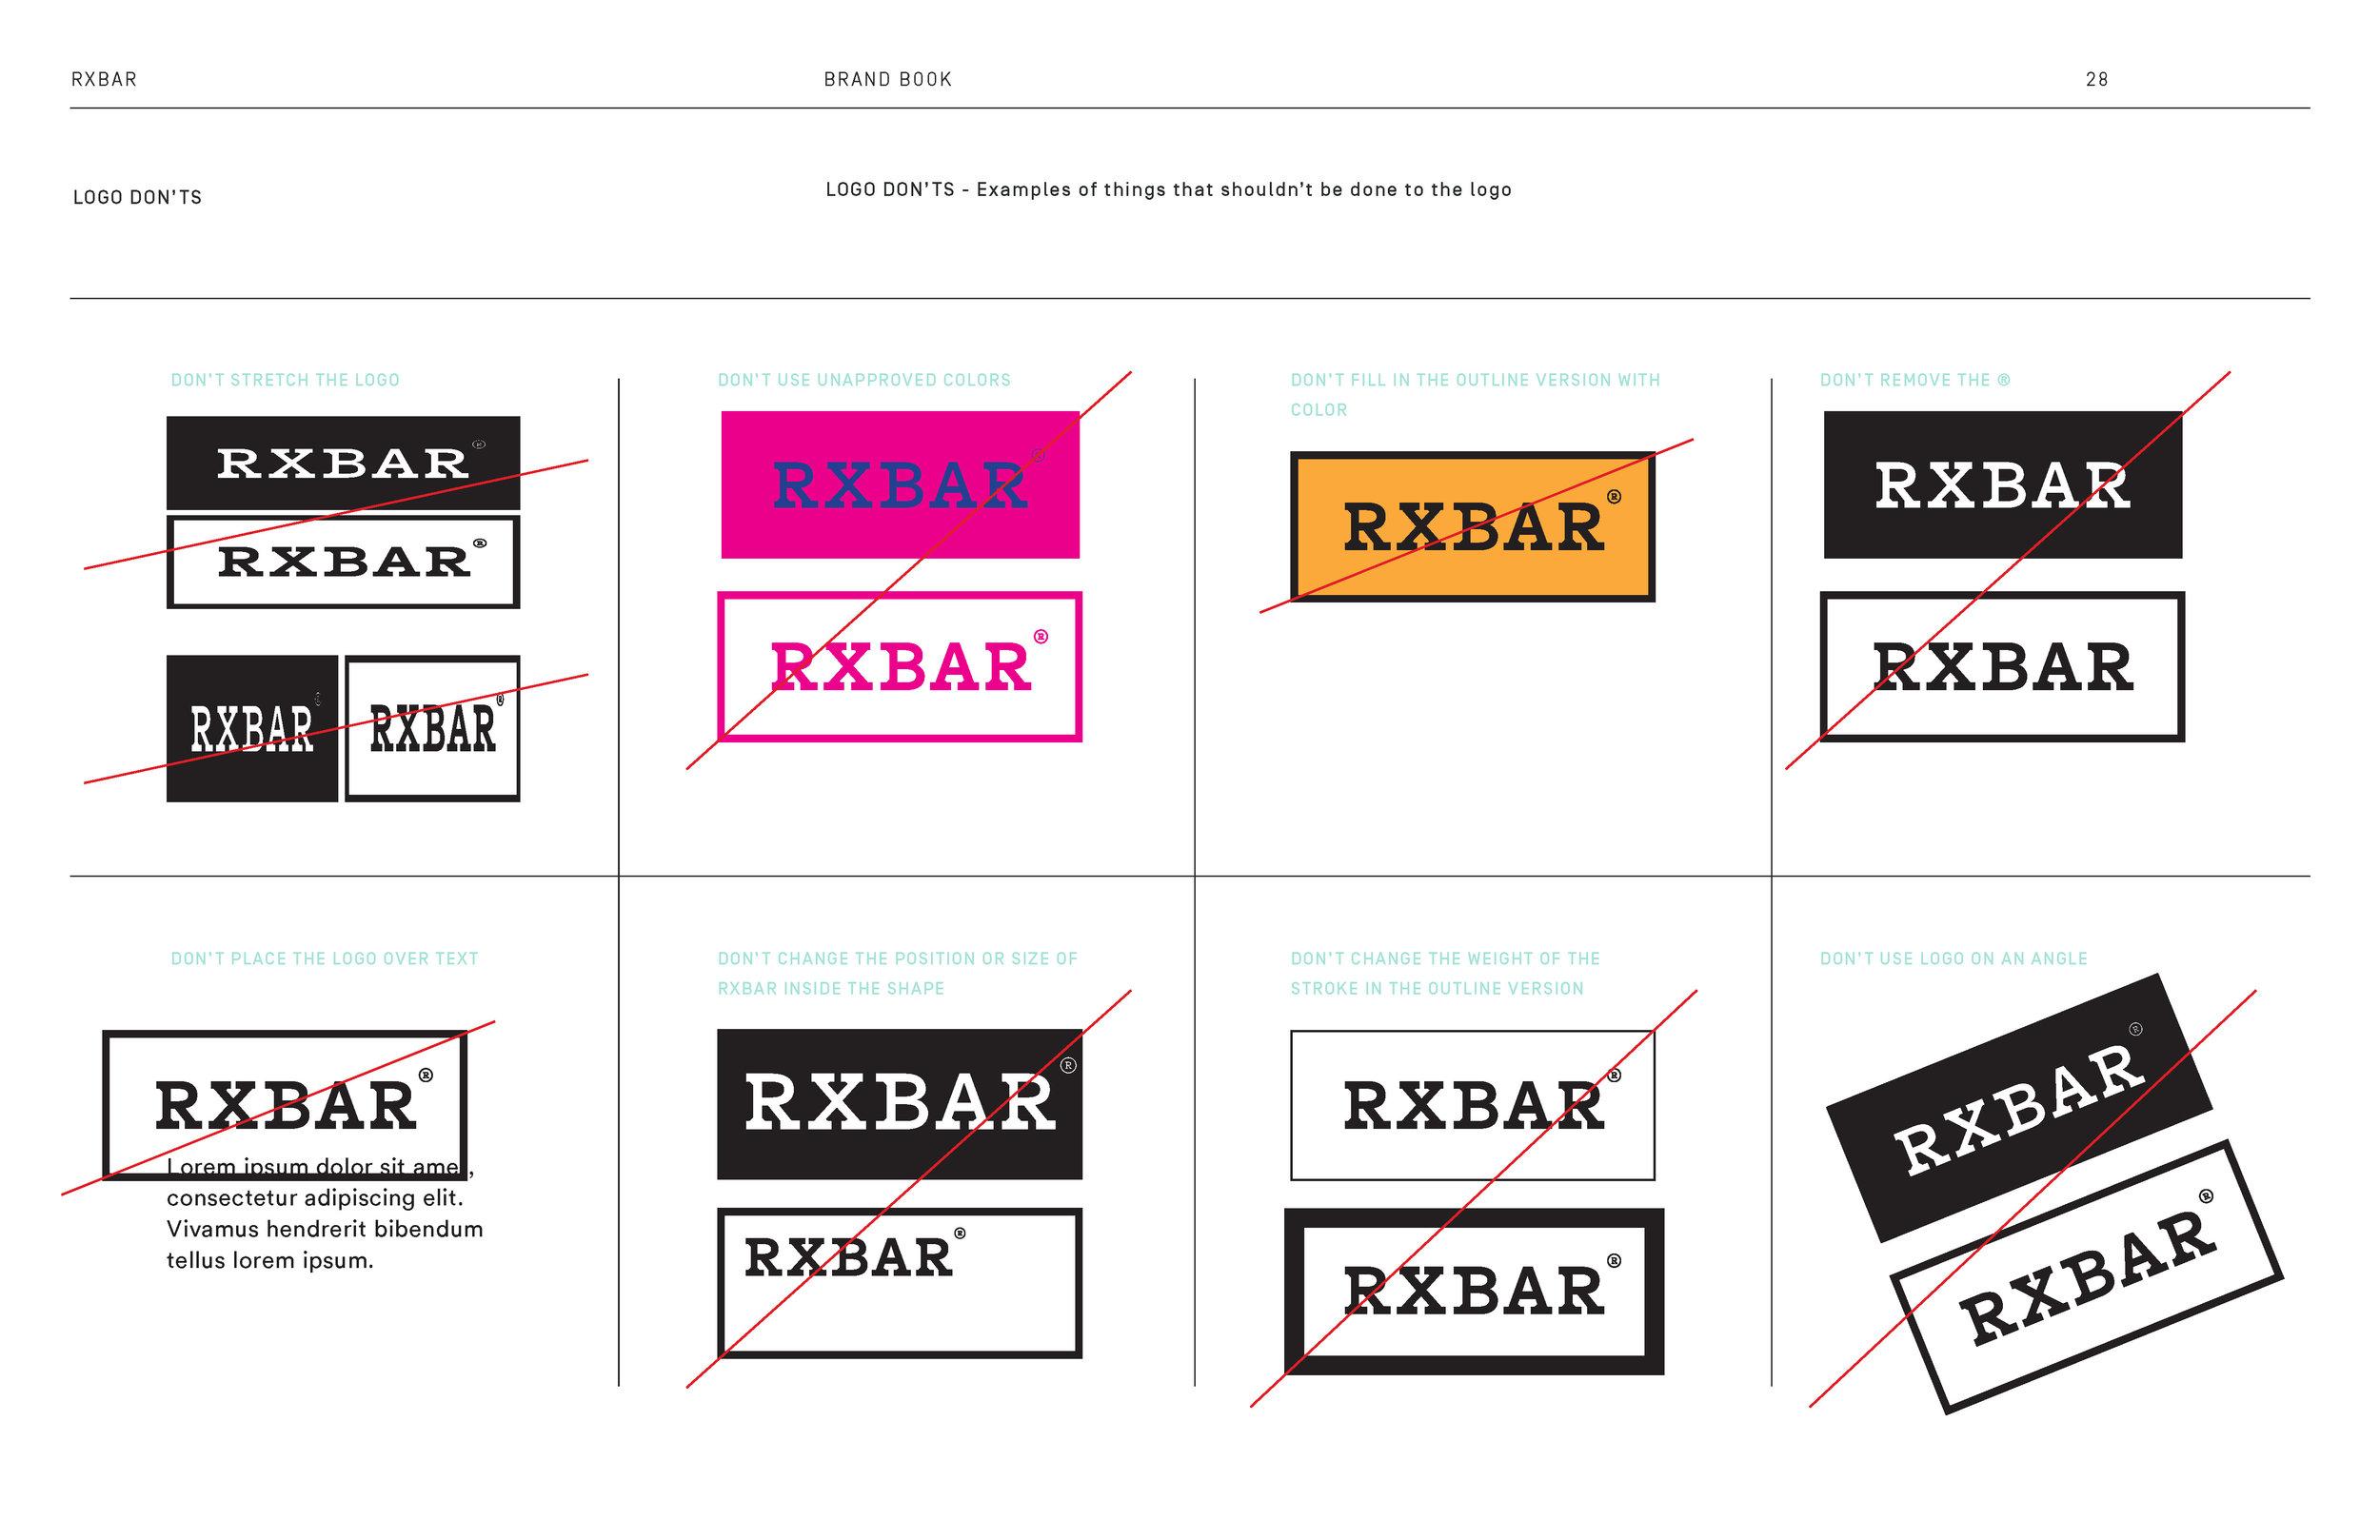 RXBAR_Brand guide_mwf_Page_28.jpg